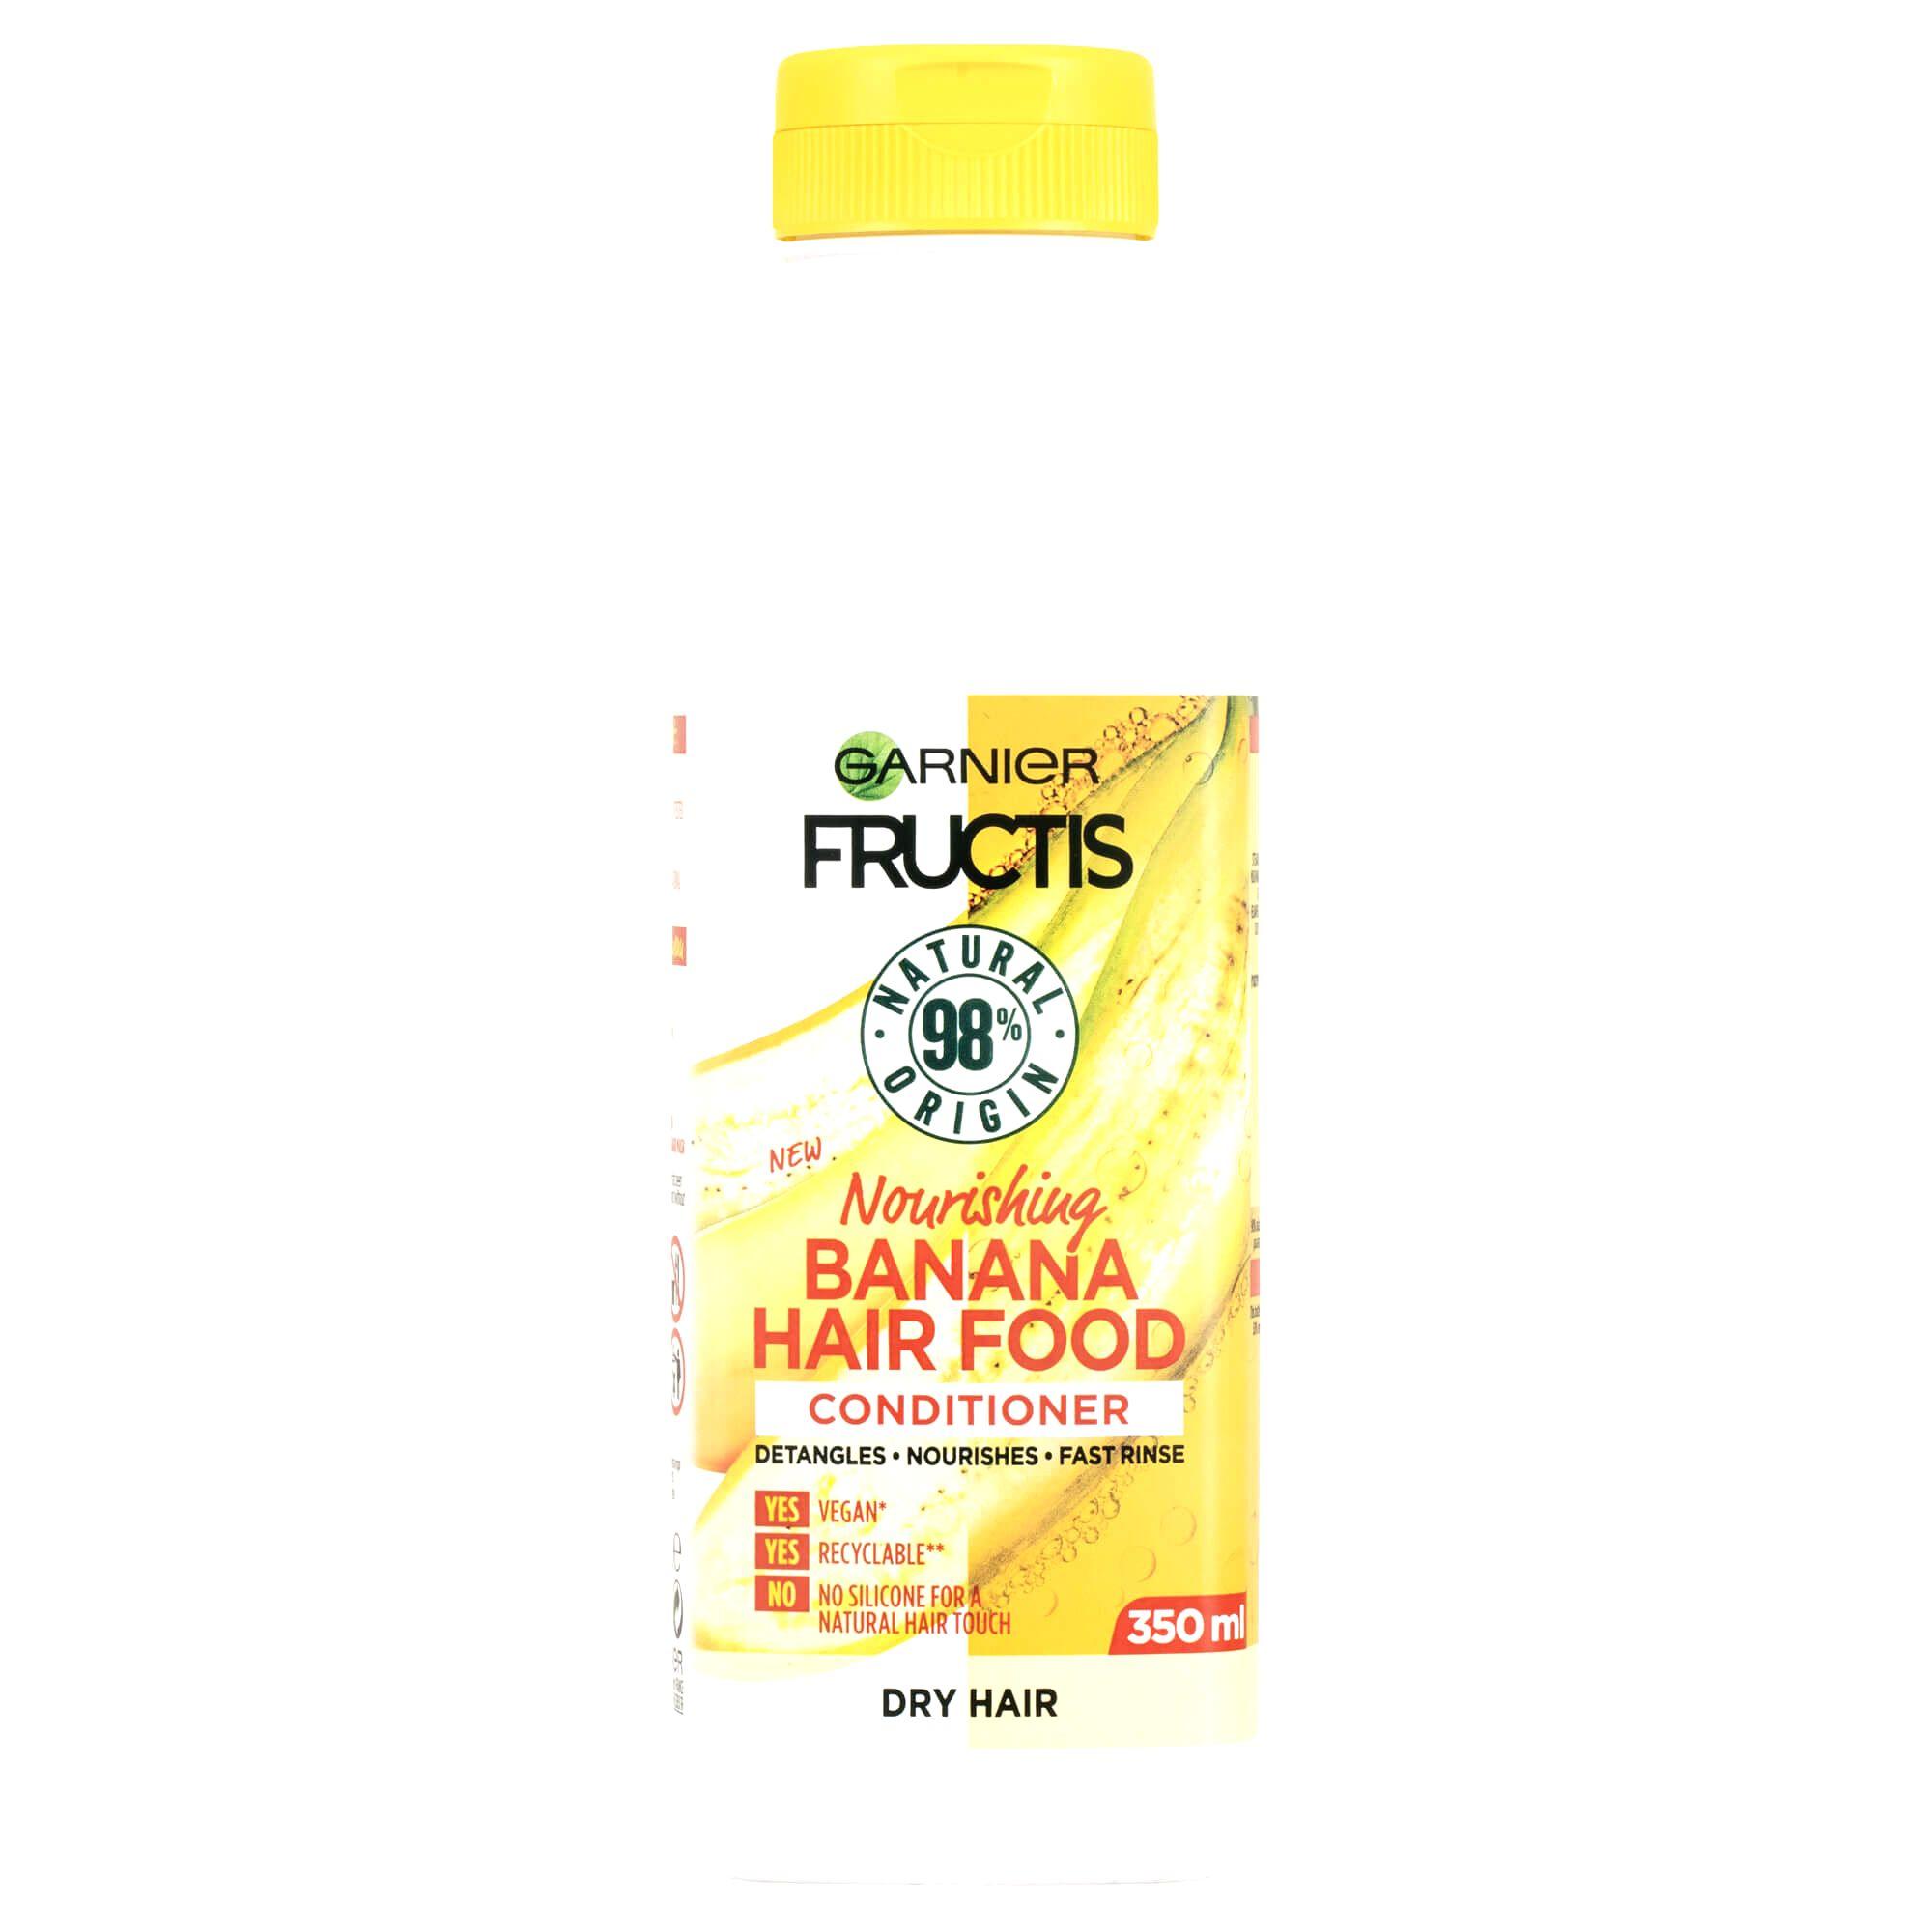 Garnier Vyživujúci kondicionér pre suché vlasy Fructis Hair Food (Banana Nourishing Conditioner) 350 ml